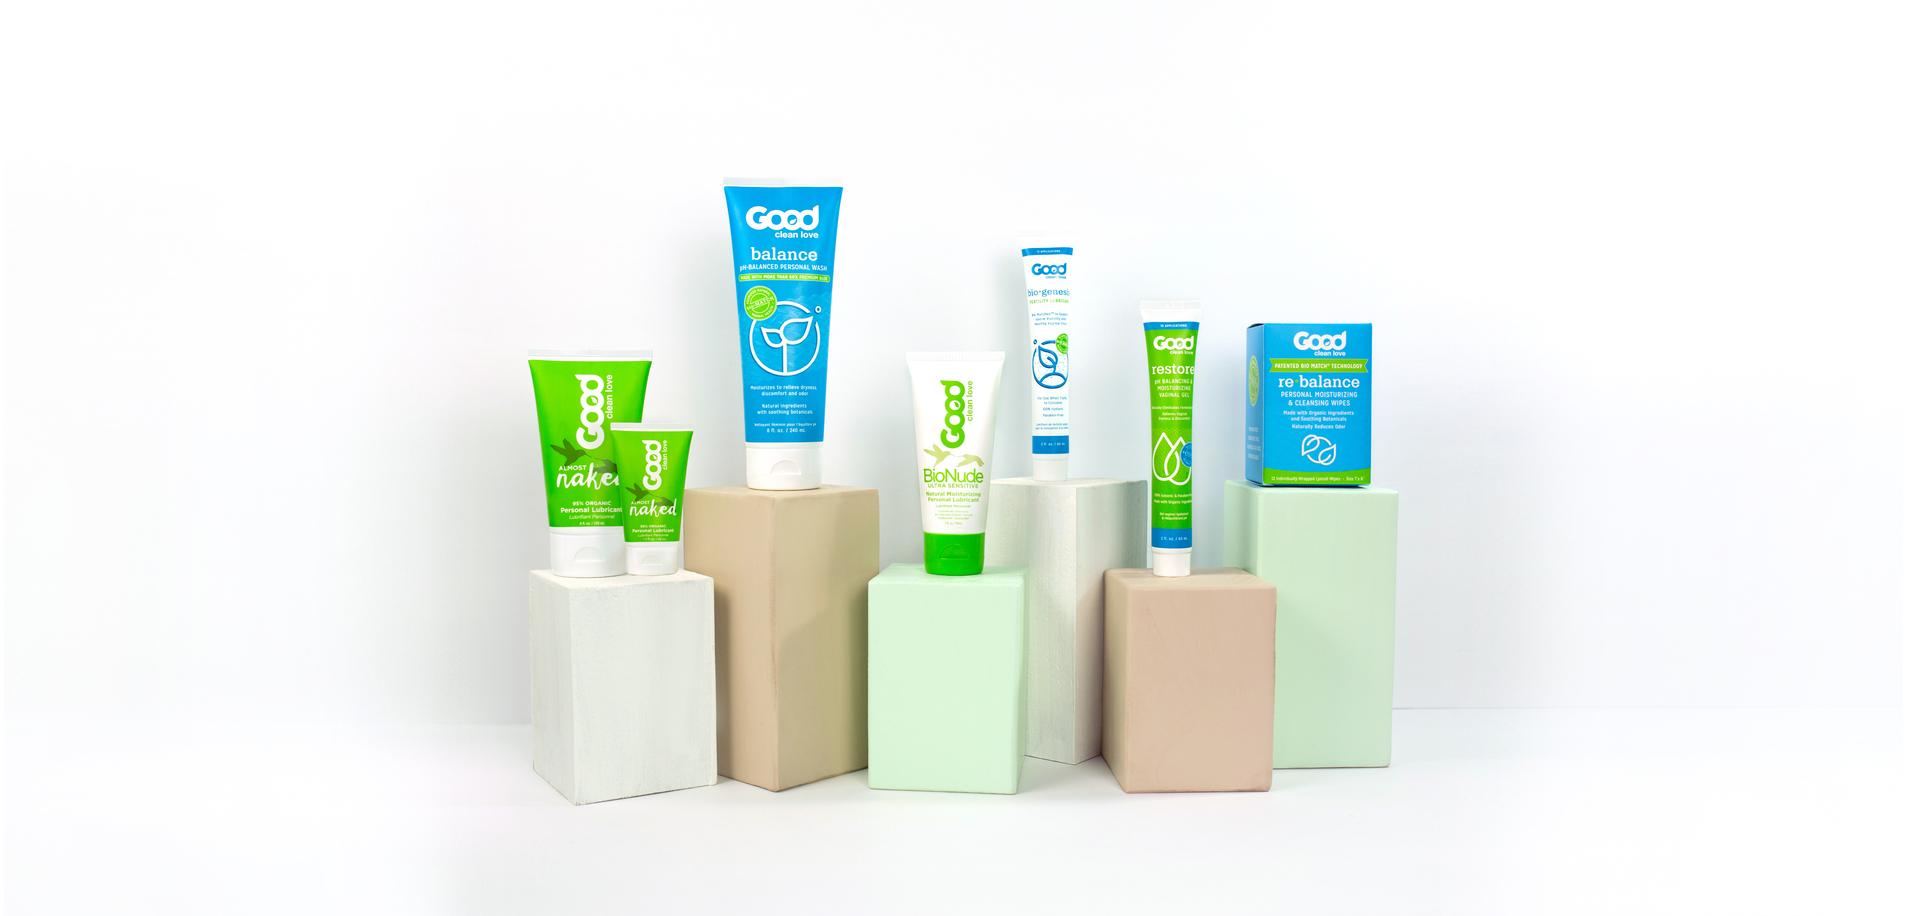 Biomatch-Good-Clean-Love-intimni-hygiena-prirodni-bio